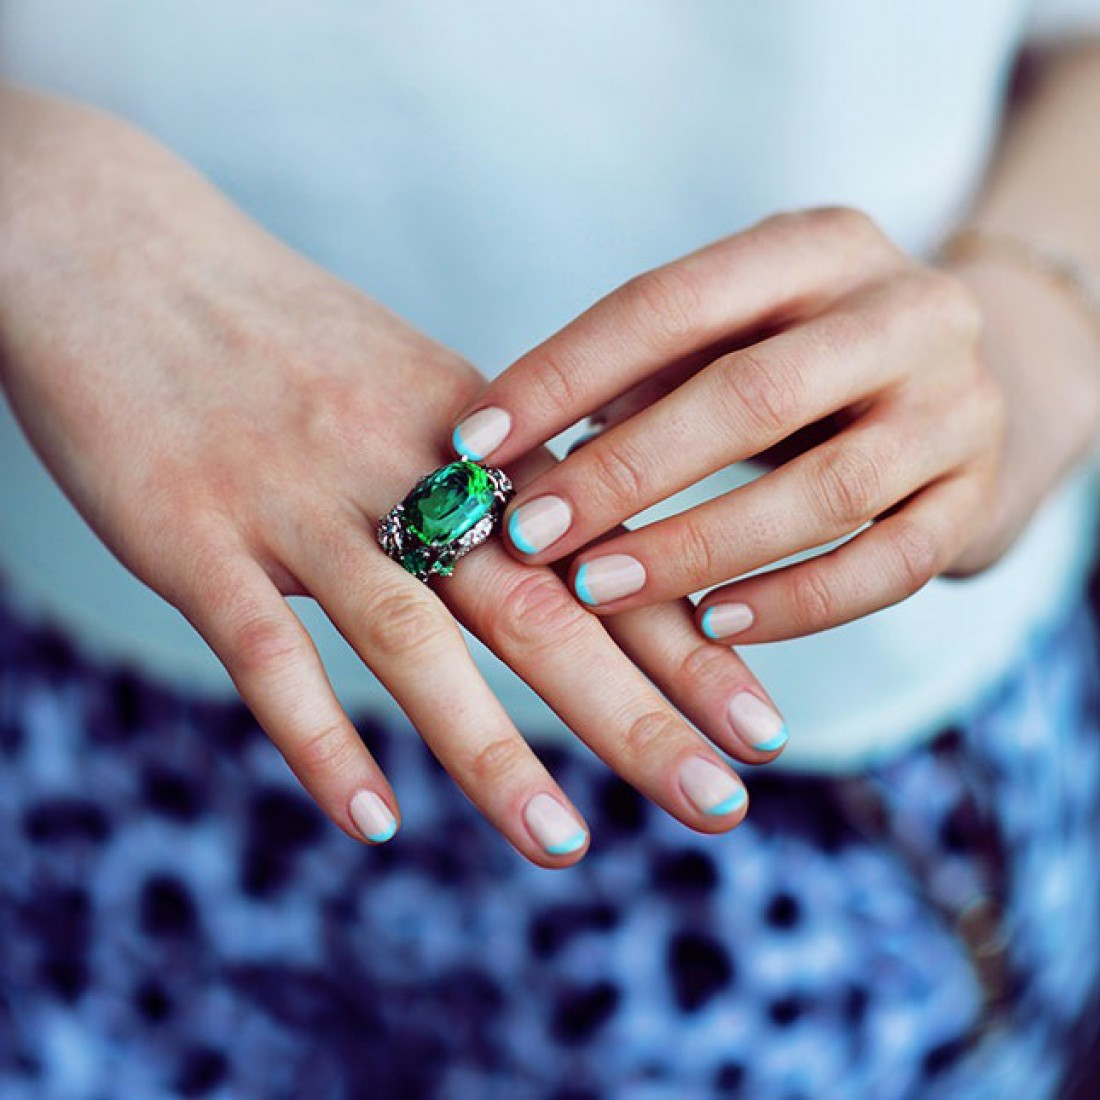 Укрепить ногти можно в домашних условиях